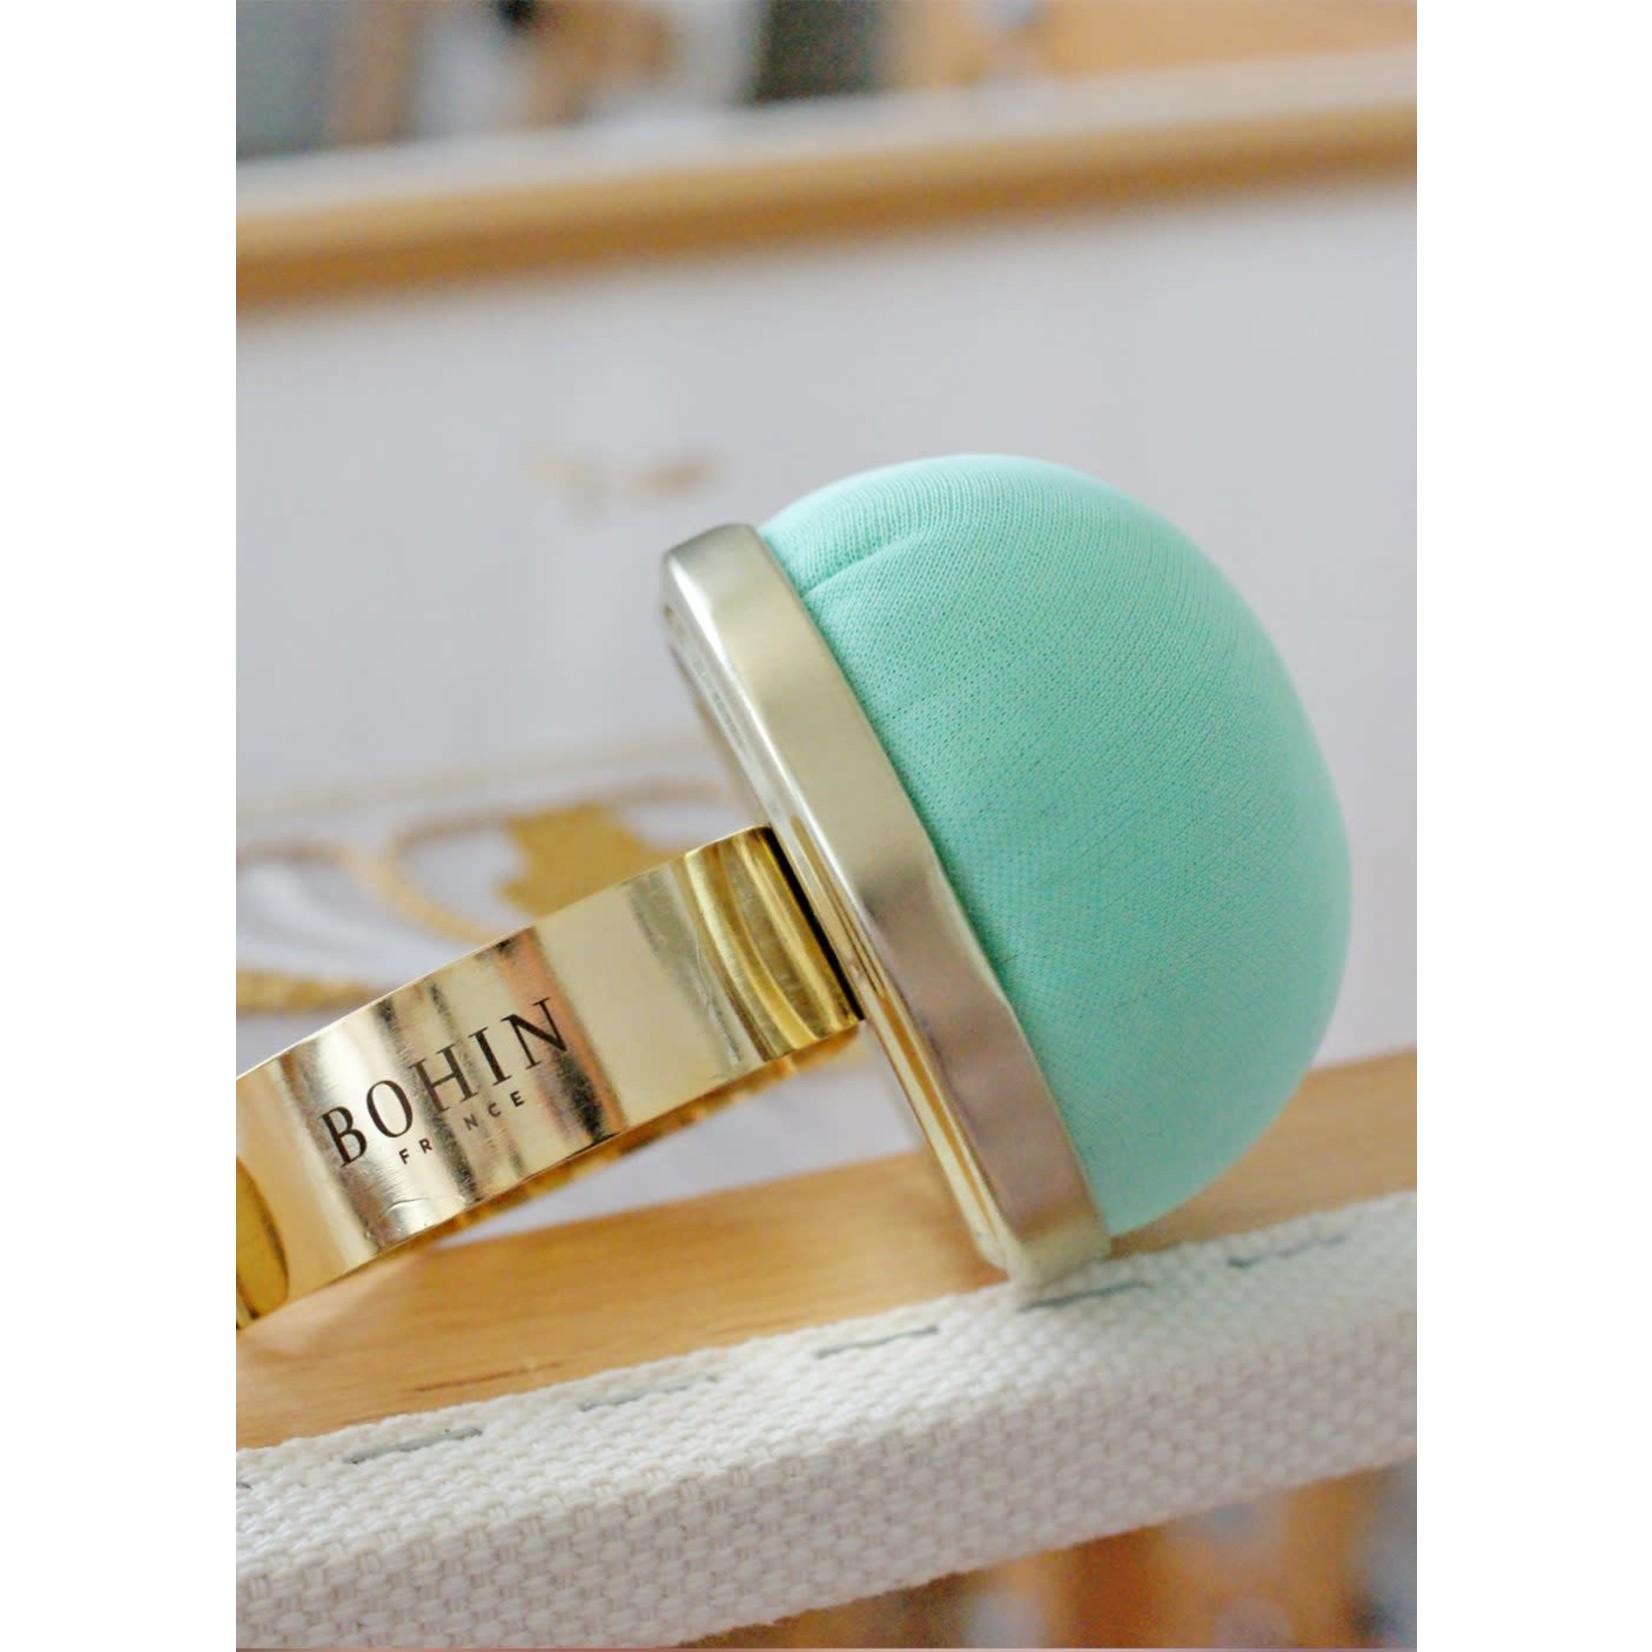 Bohin Pin Cushion with Gilt Bracelet